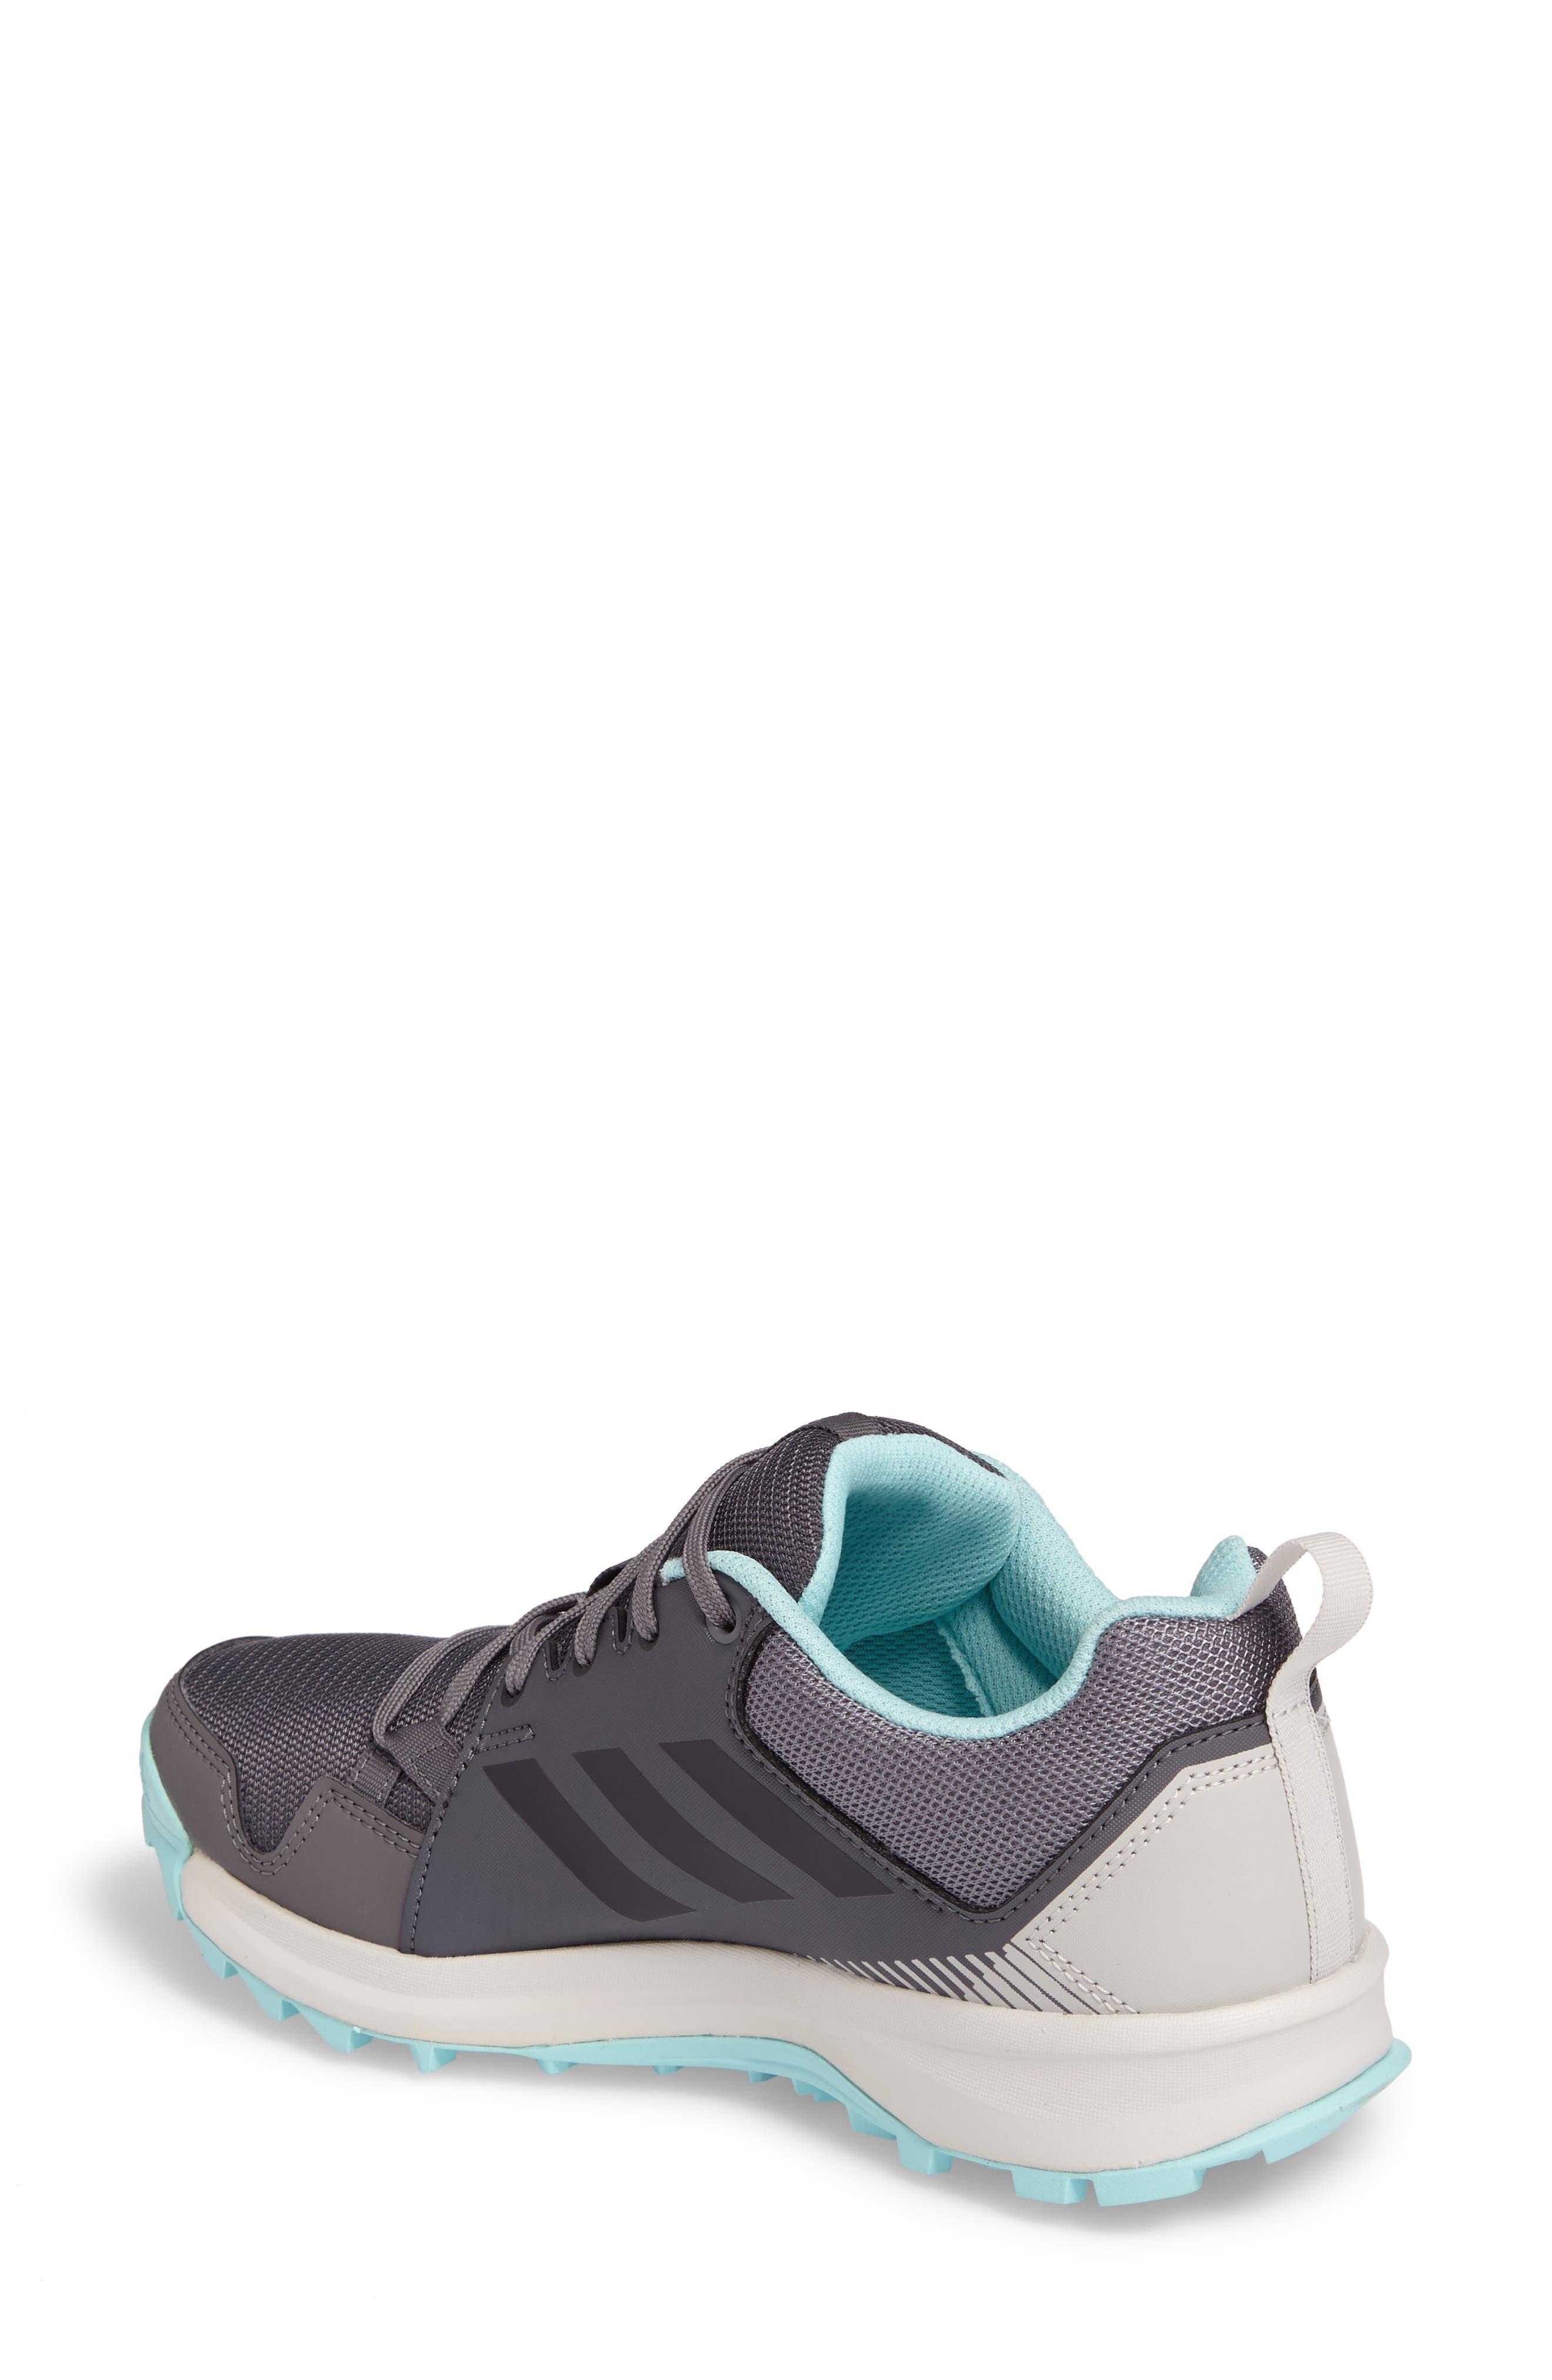 Alternate Image 2  - adidas 'Tracerocker' Athletic Sneaker (Women)